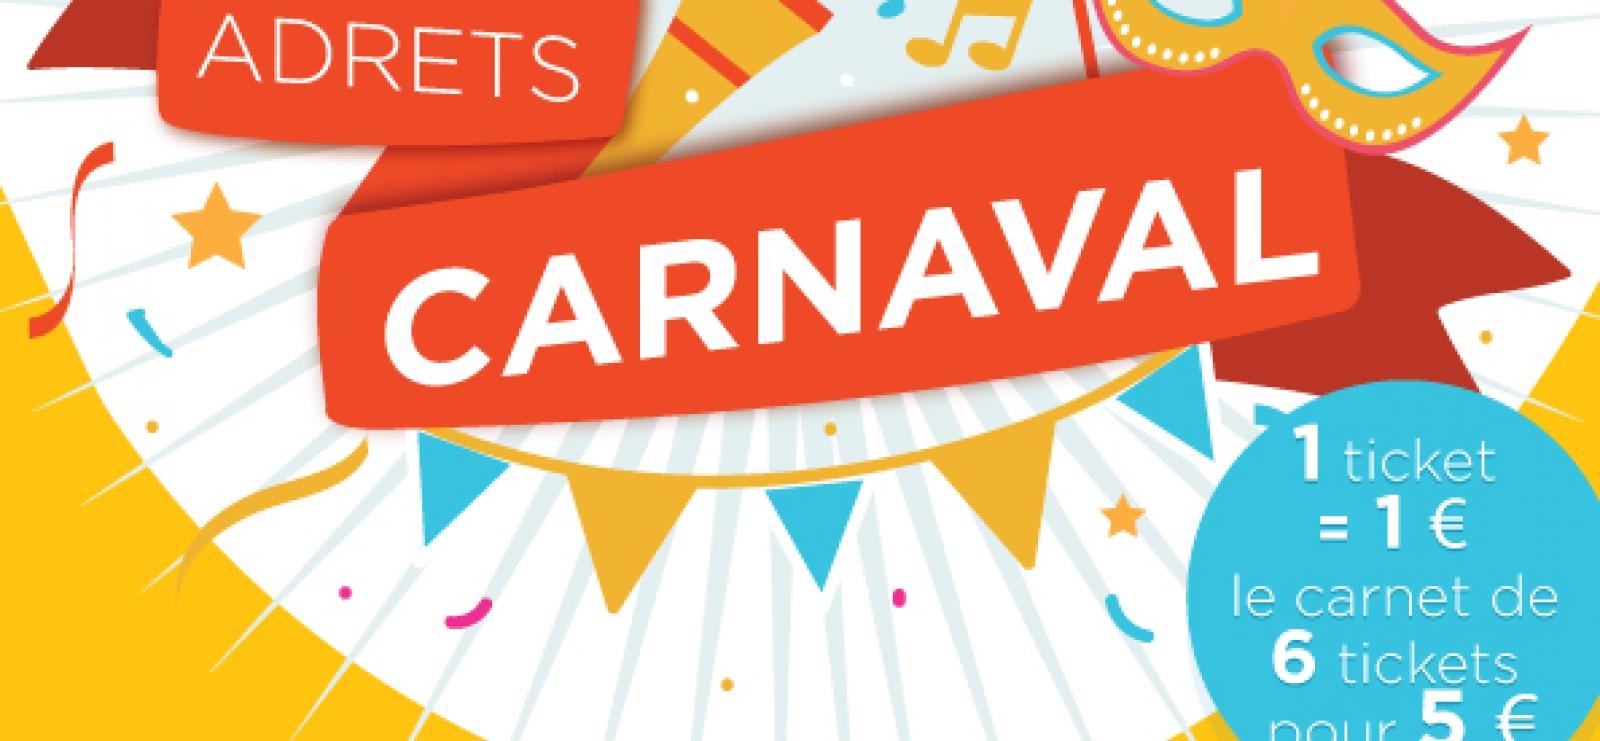 Carnaval Adrets